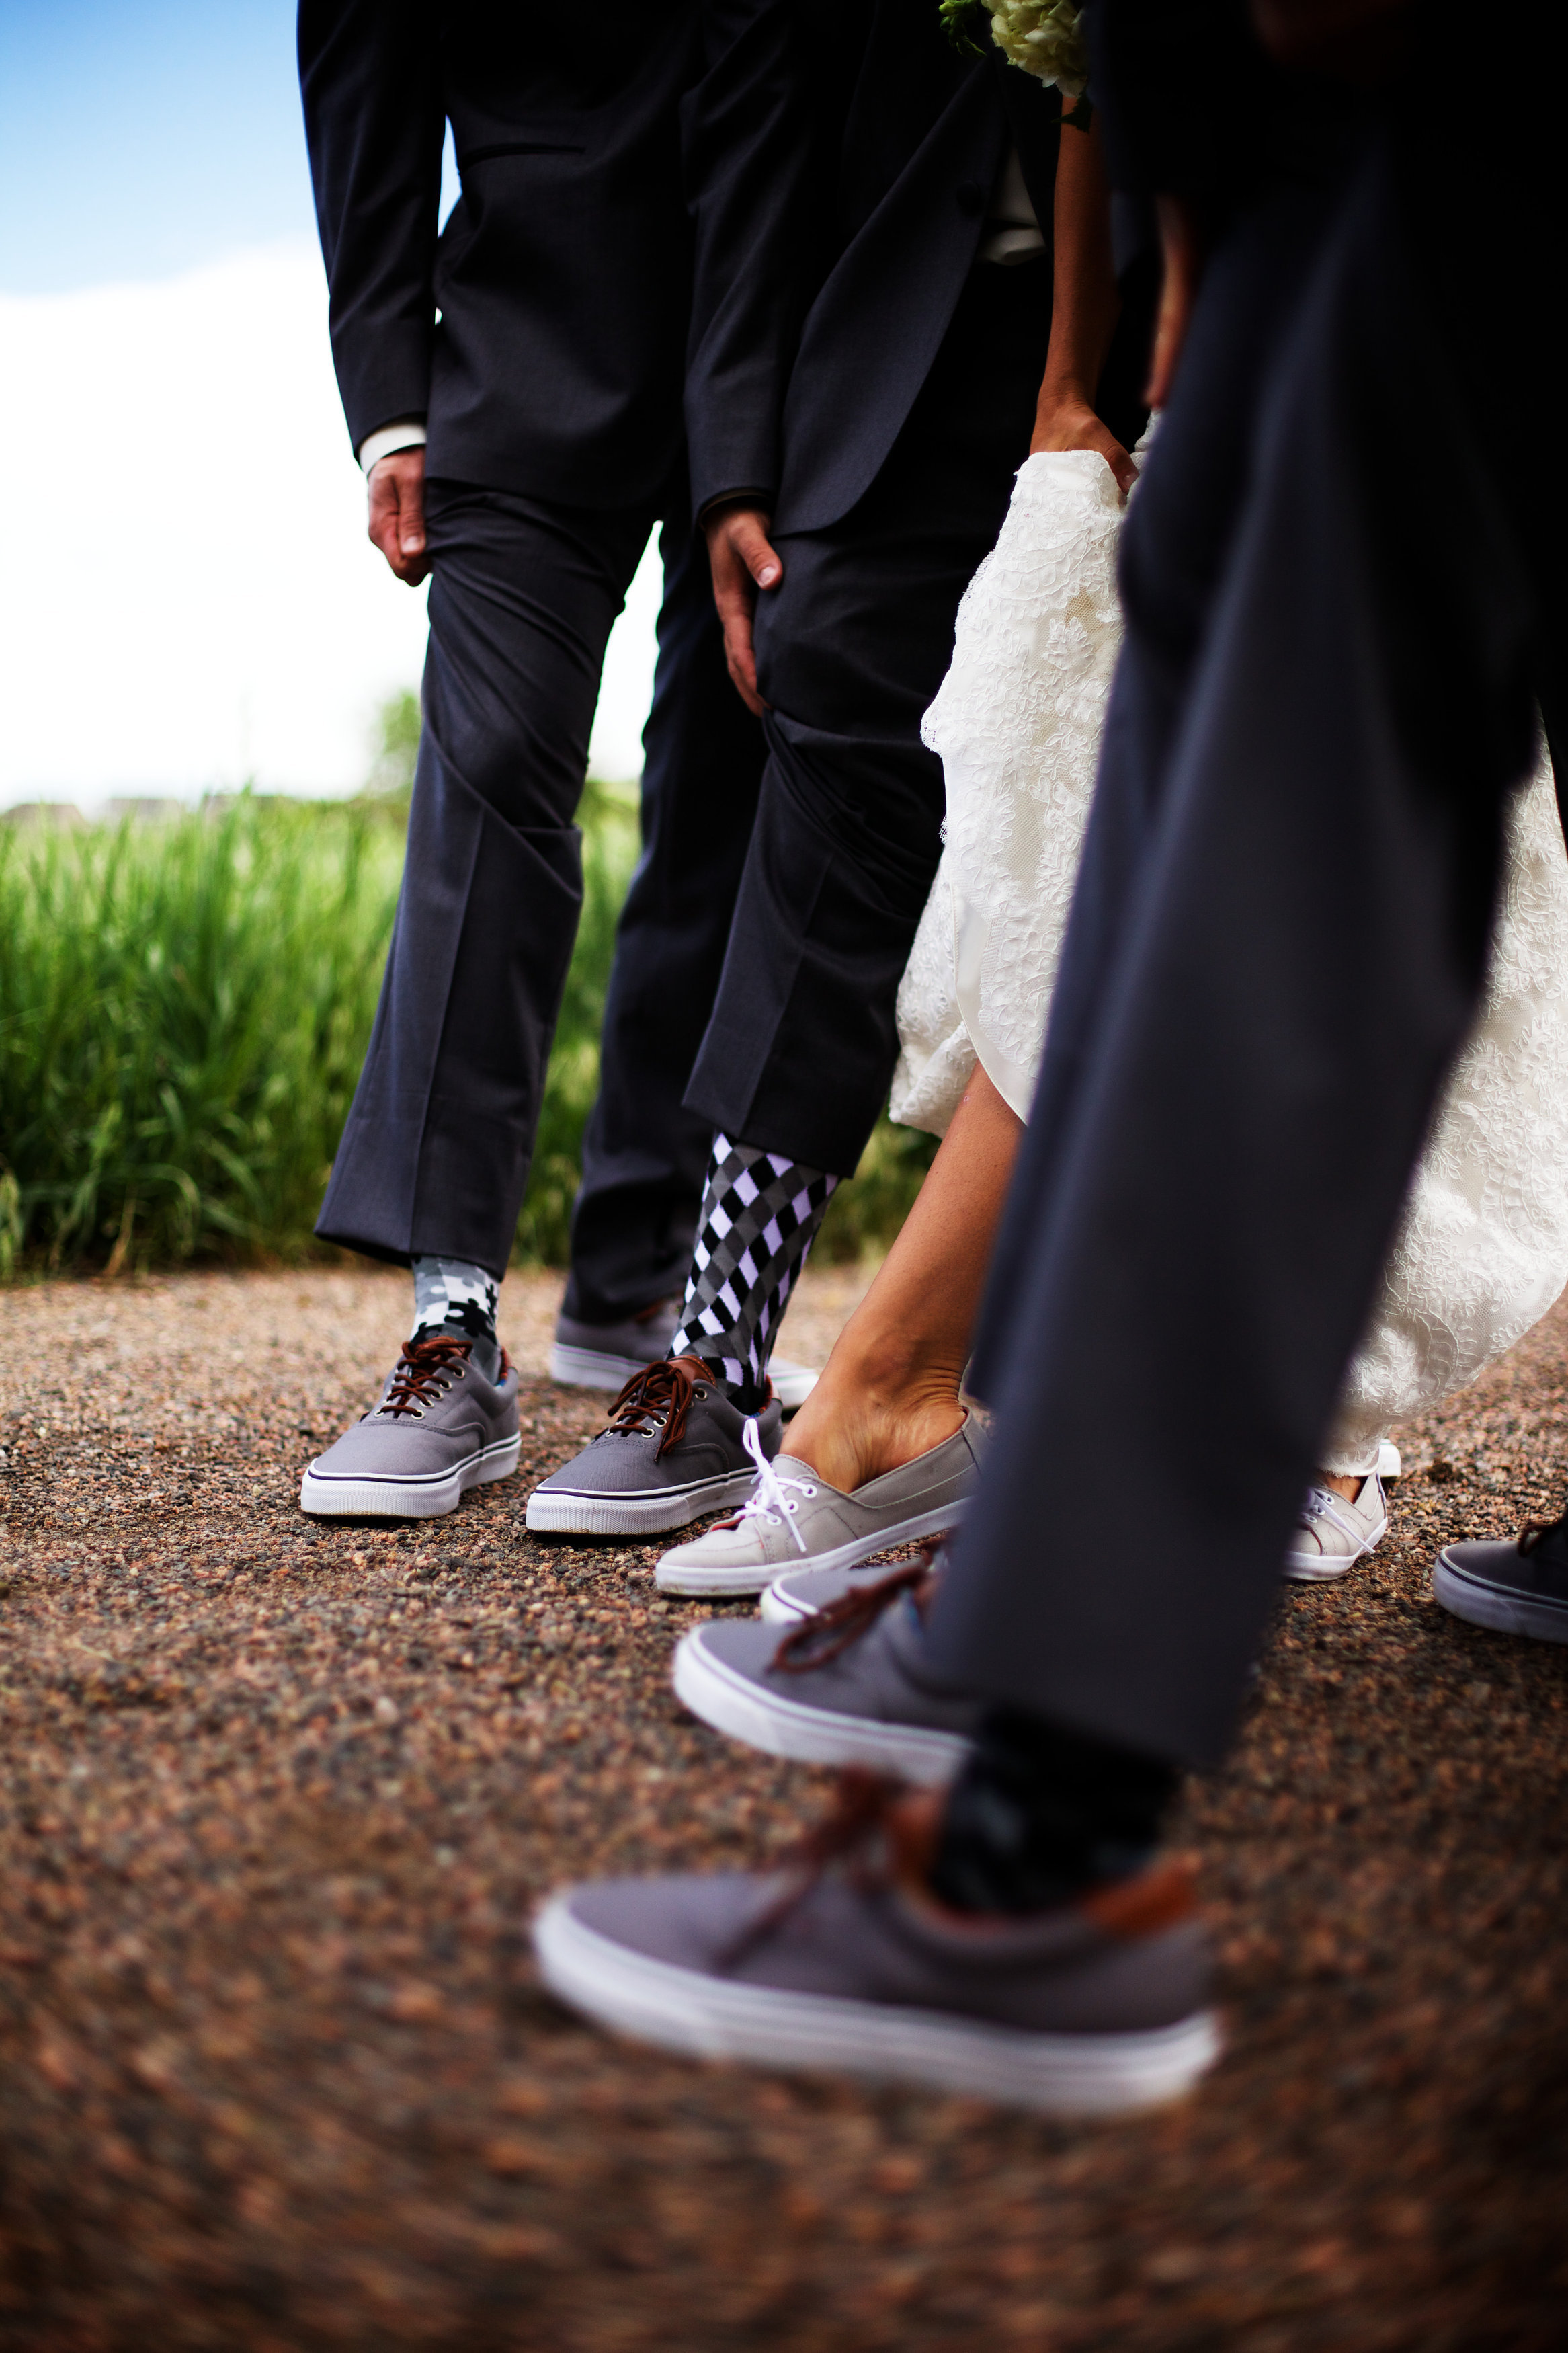 Vans Wedding Shoes Online Sale, UP TO 57% OFF